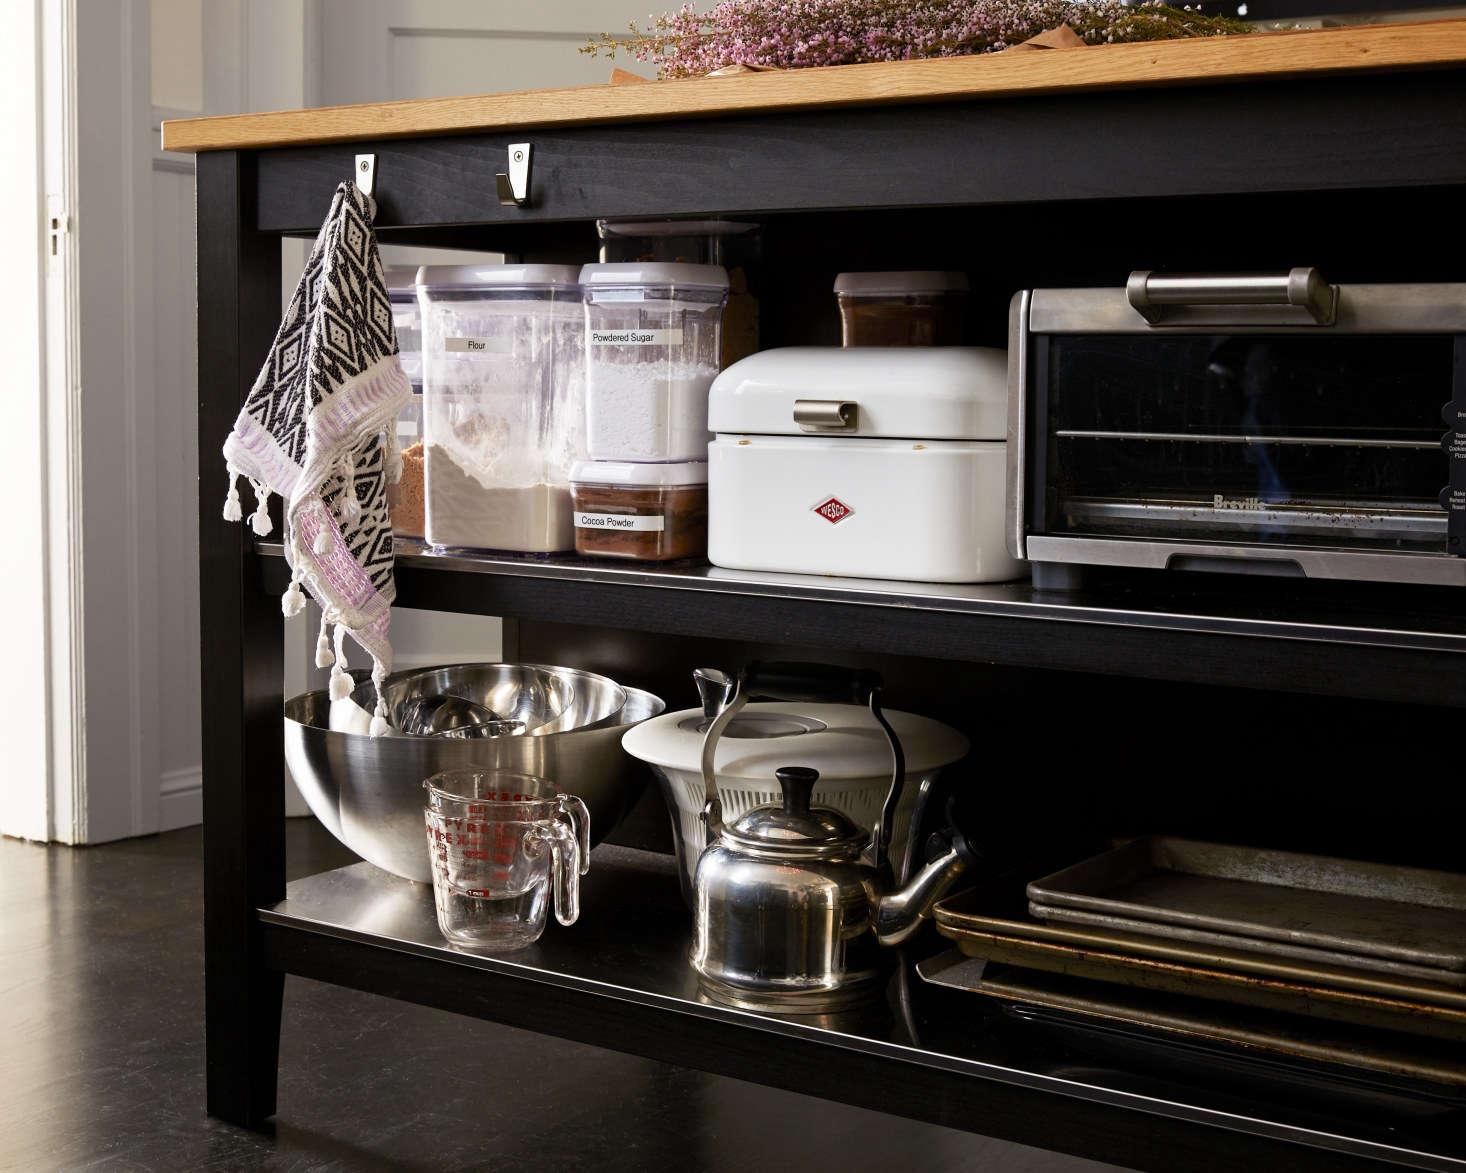 Kitchen of the week a glamorous kitchen in san francisco - Kitchen appliances san francisco ...